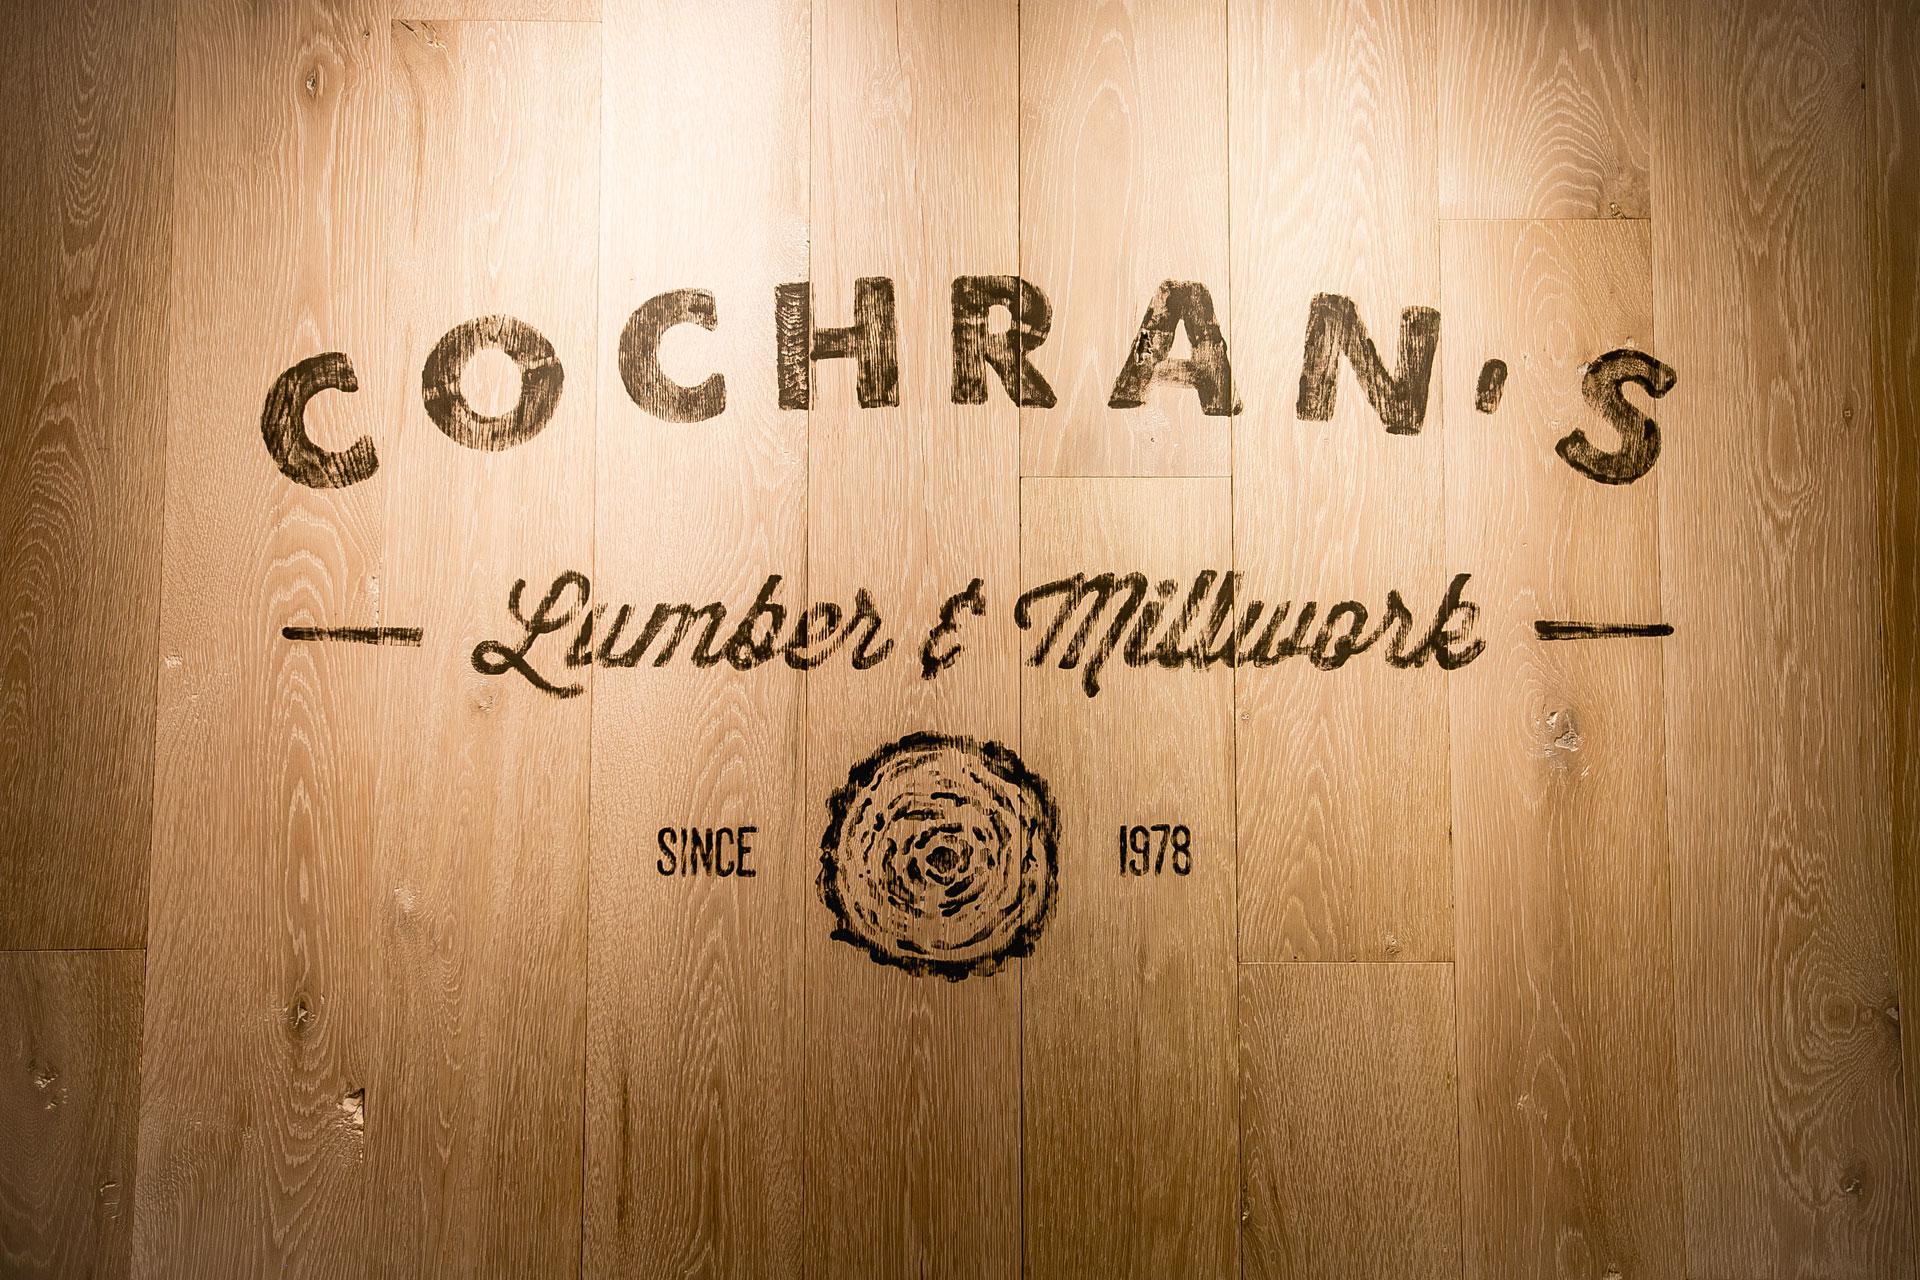 Cochrans-Lumber-and-Millwork.jpg